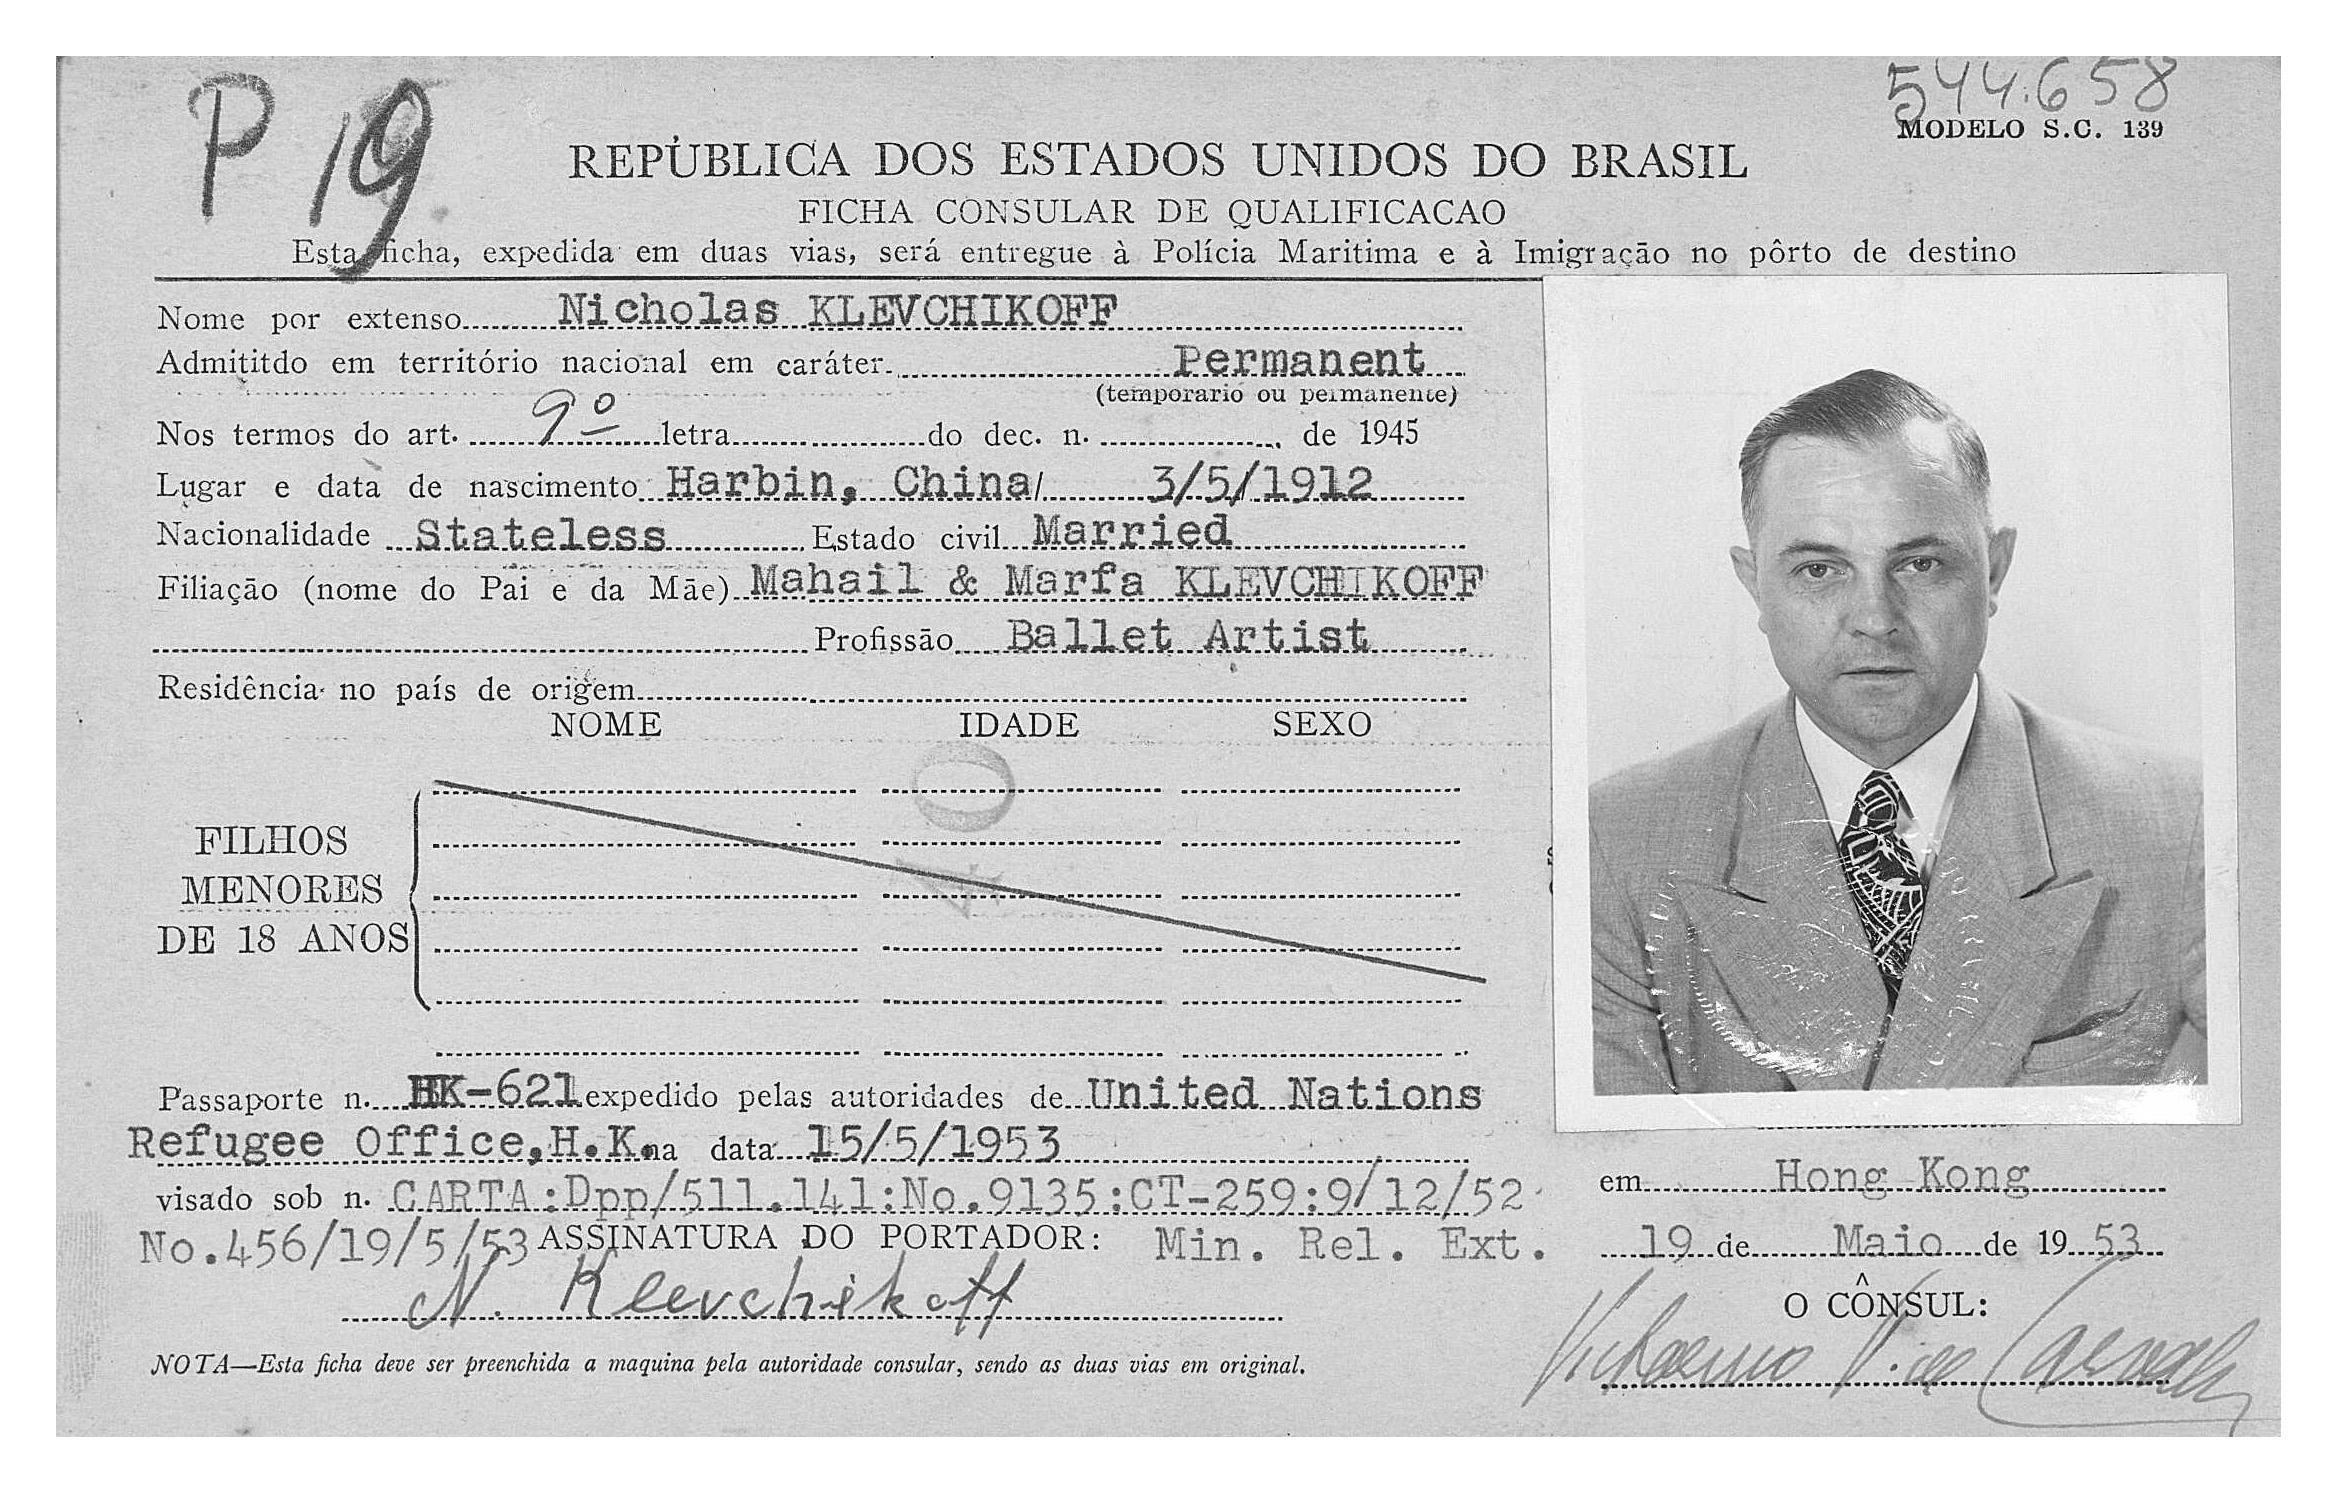 Nicholas-1953-05-ficha-consular-RJ-03-copy1.jpg